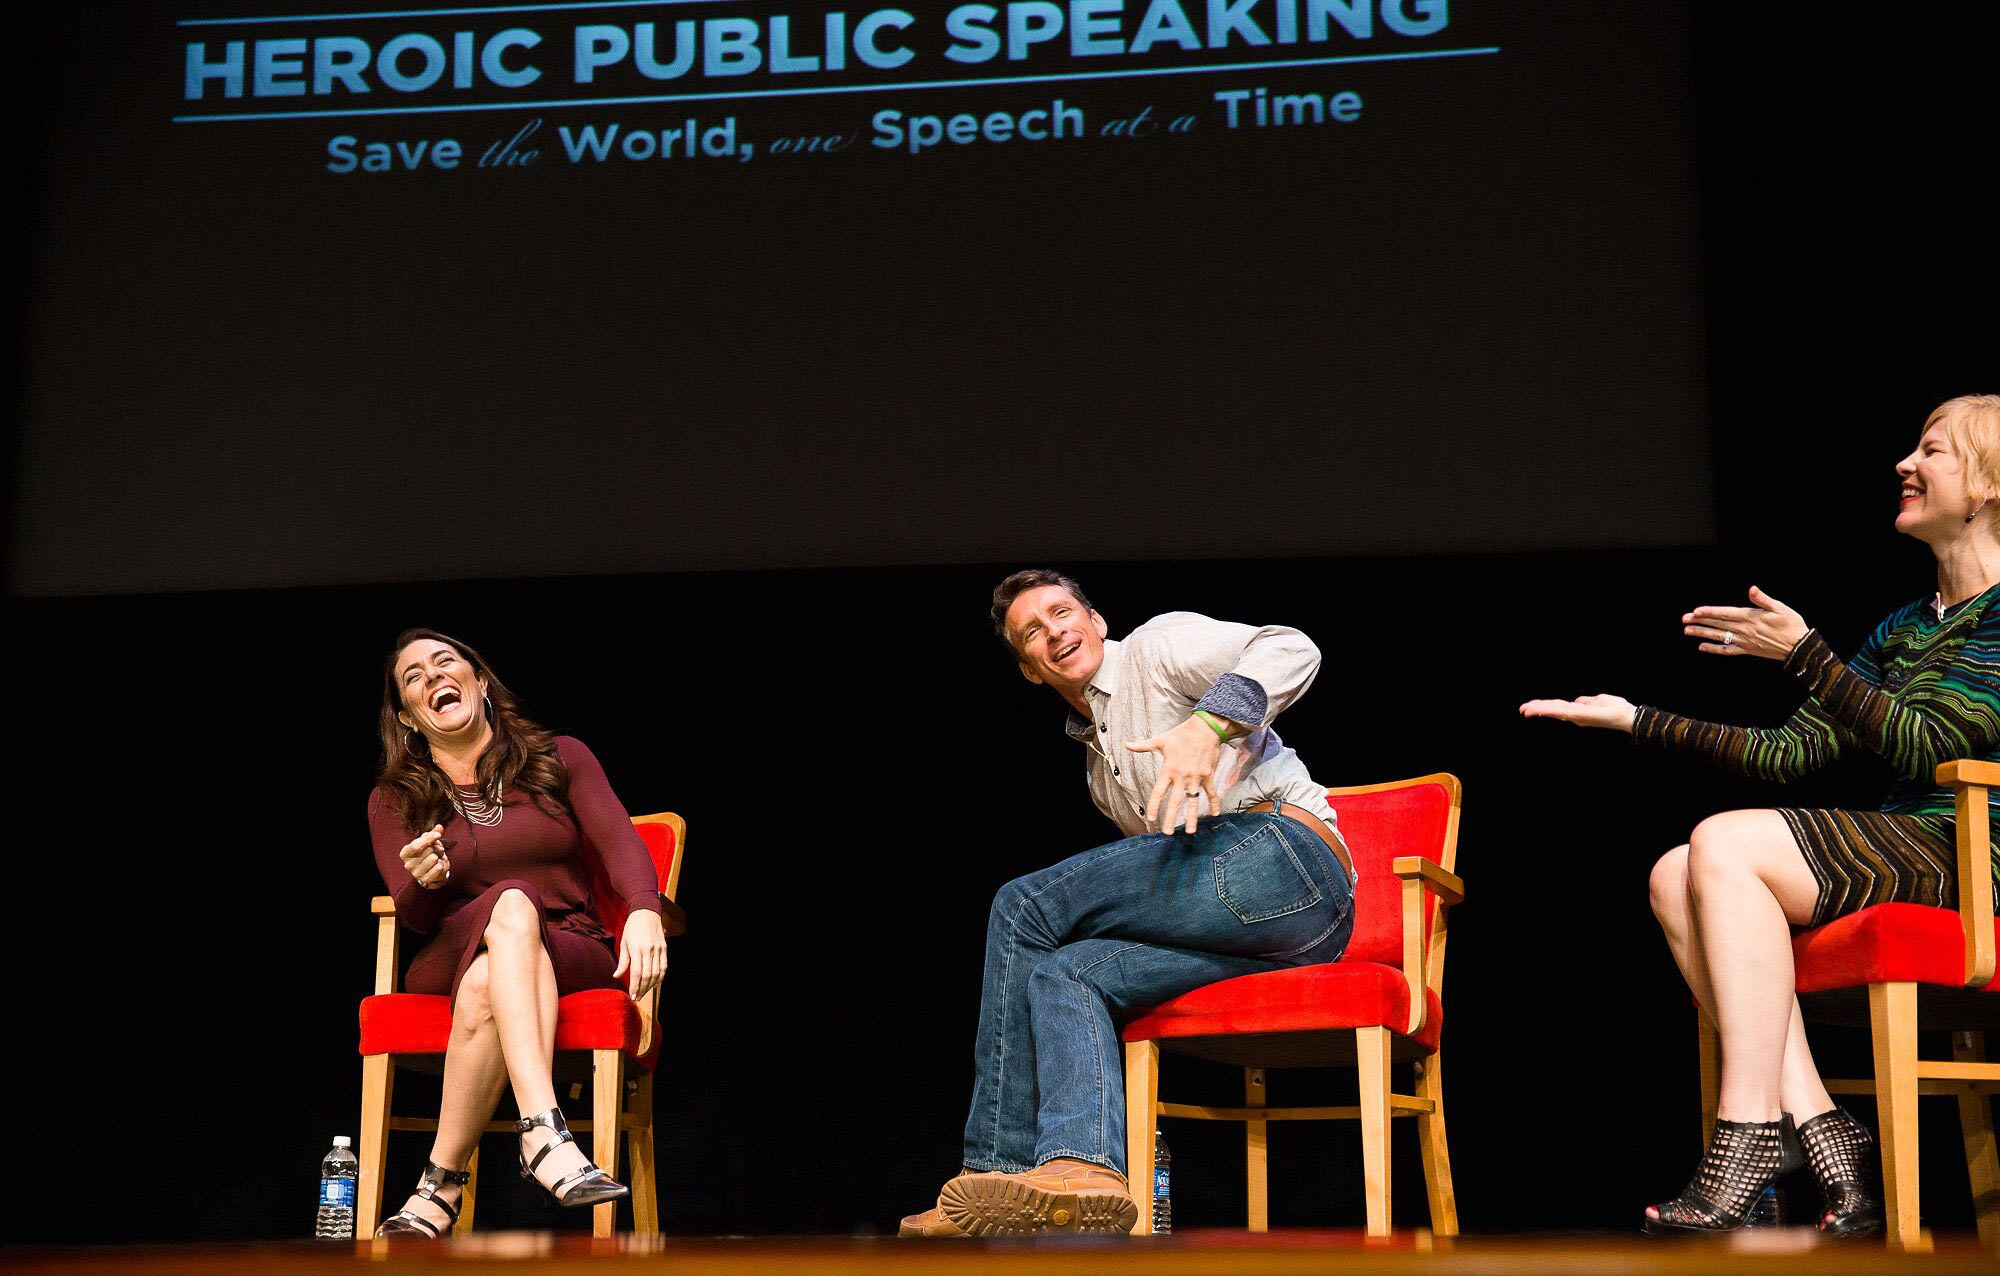 Elizabeth making the panelists laugh - better language here but focus on behavior